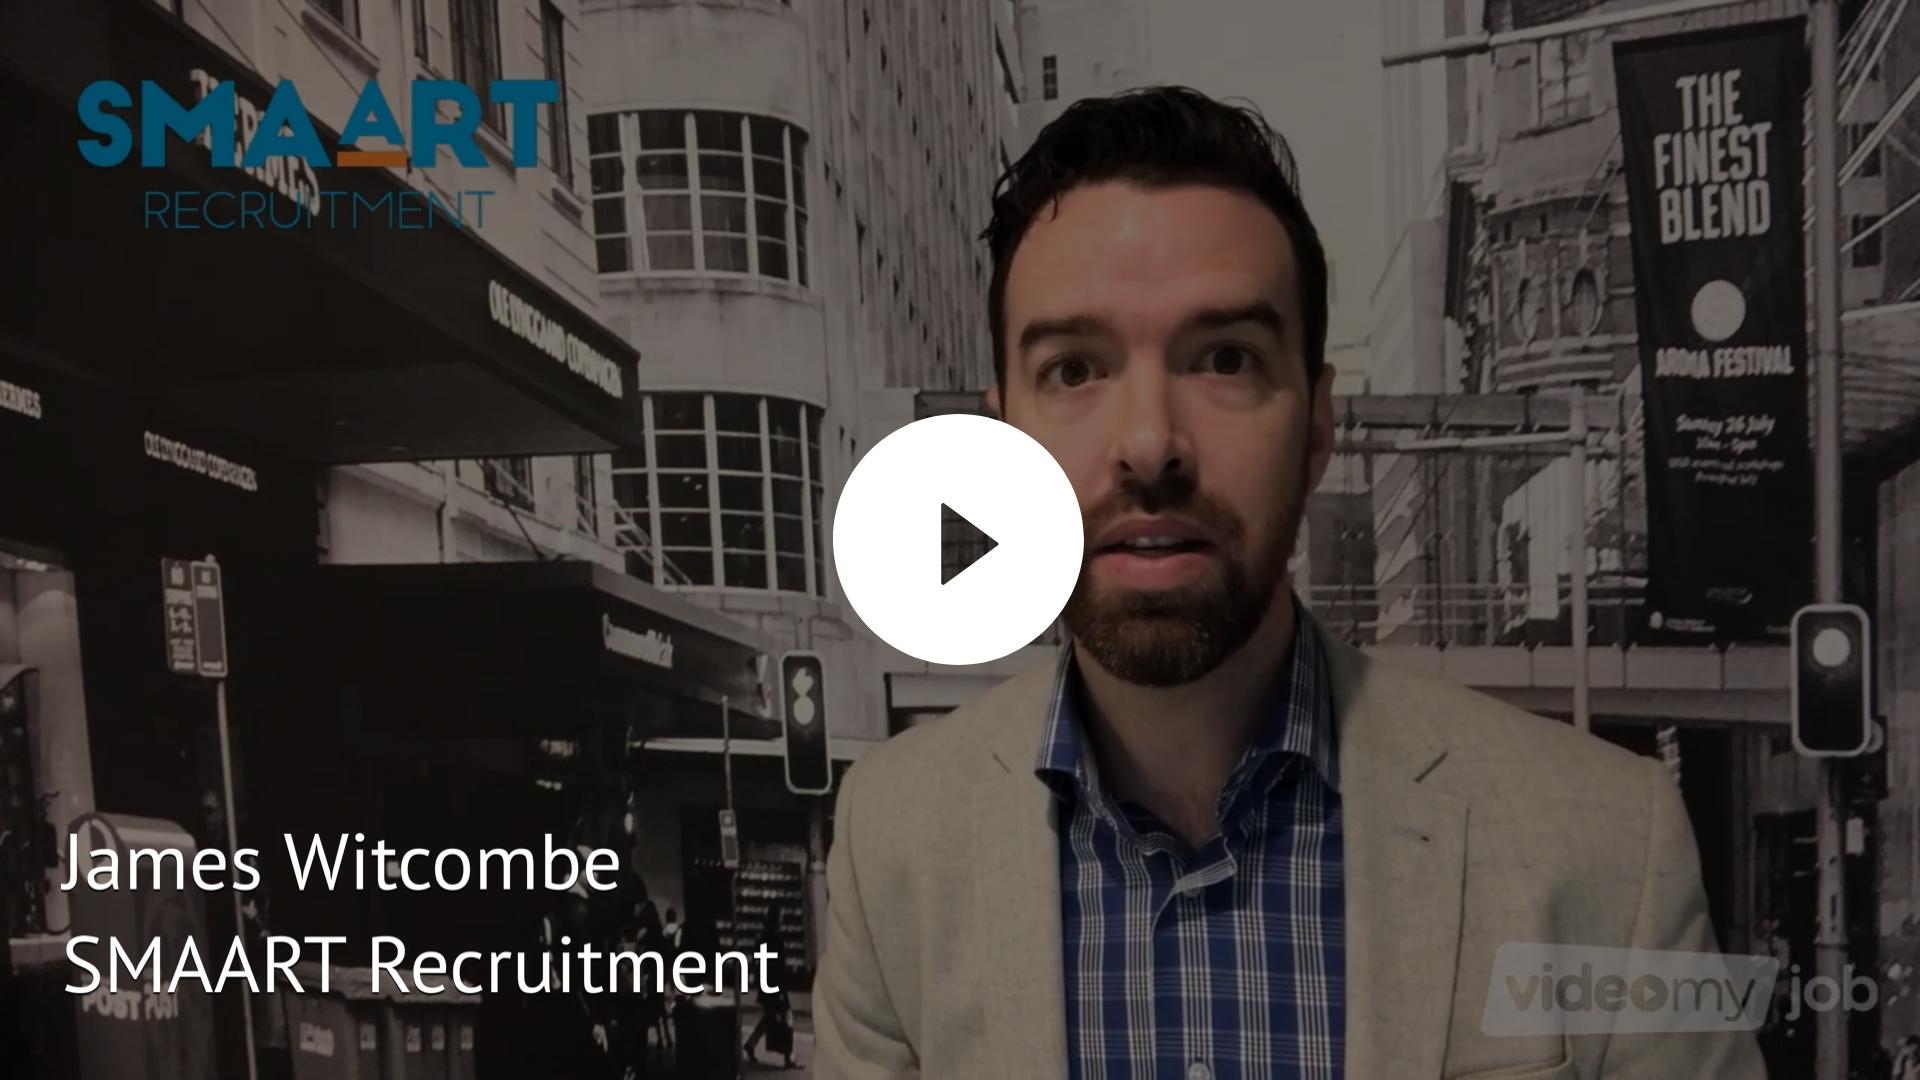 James_Witcombe_SMAART_Recruitment (1)